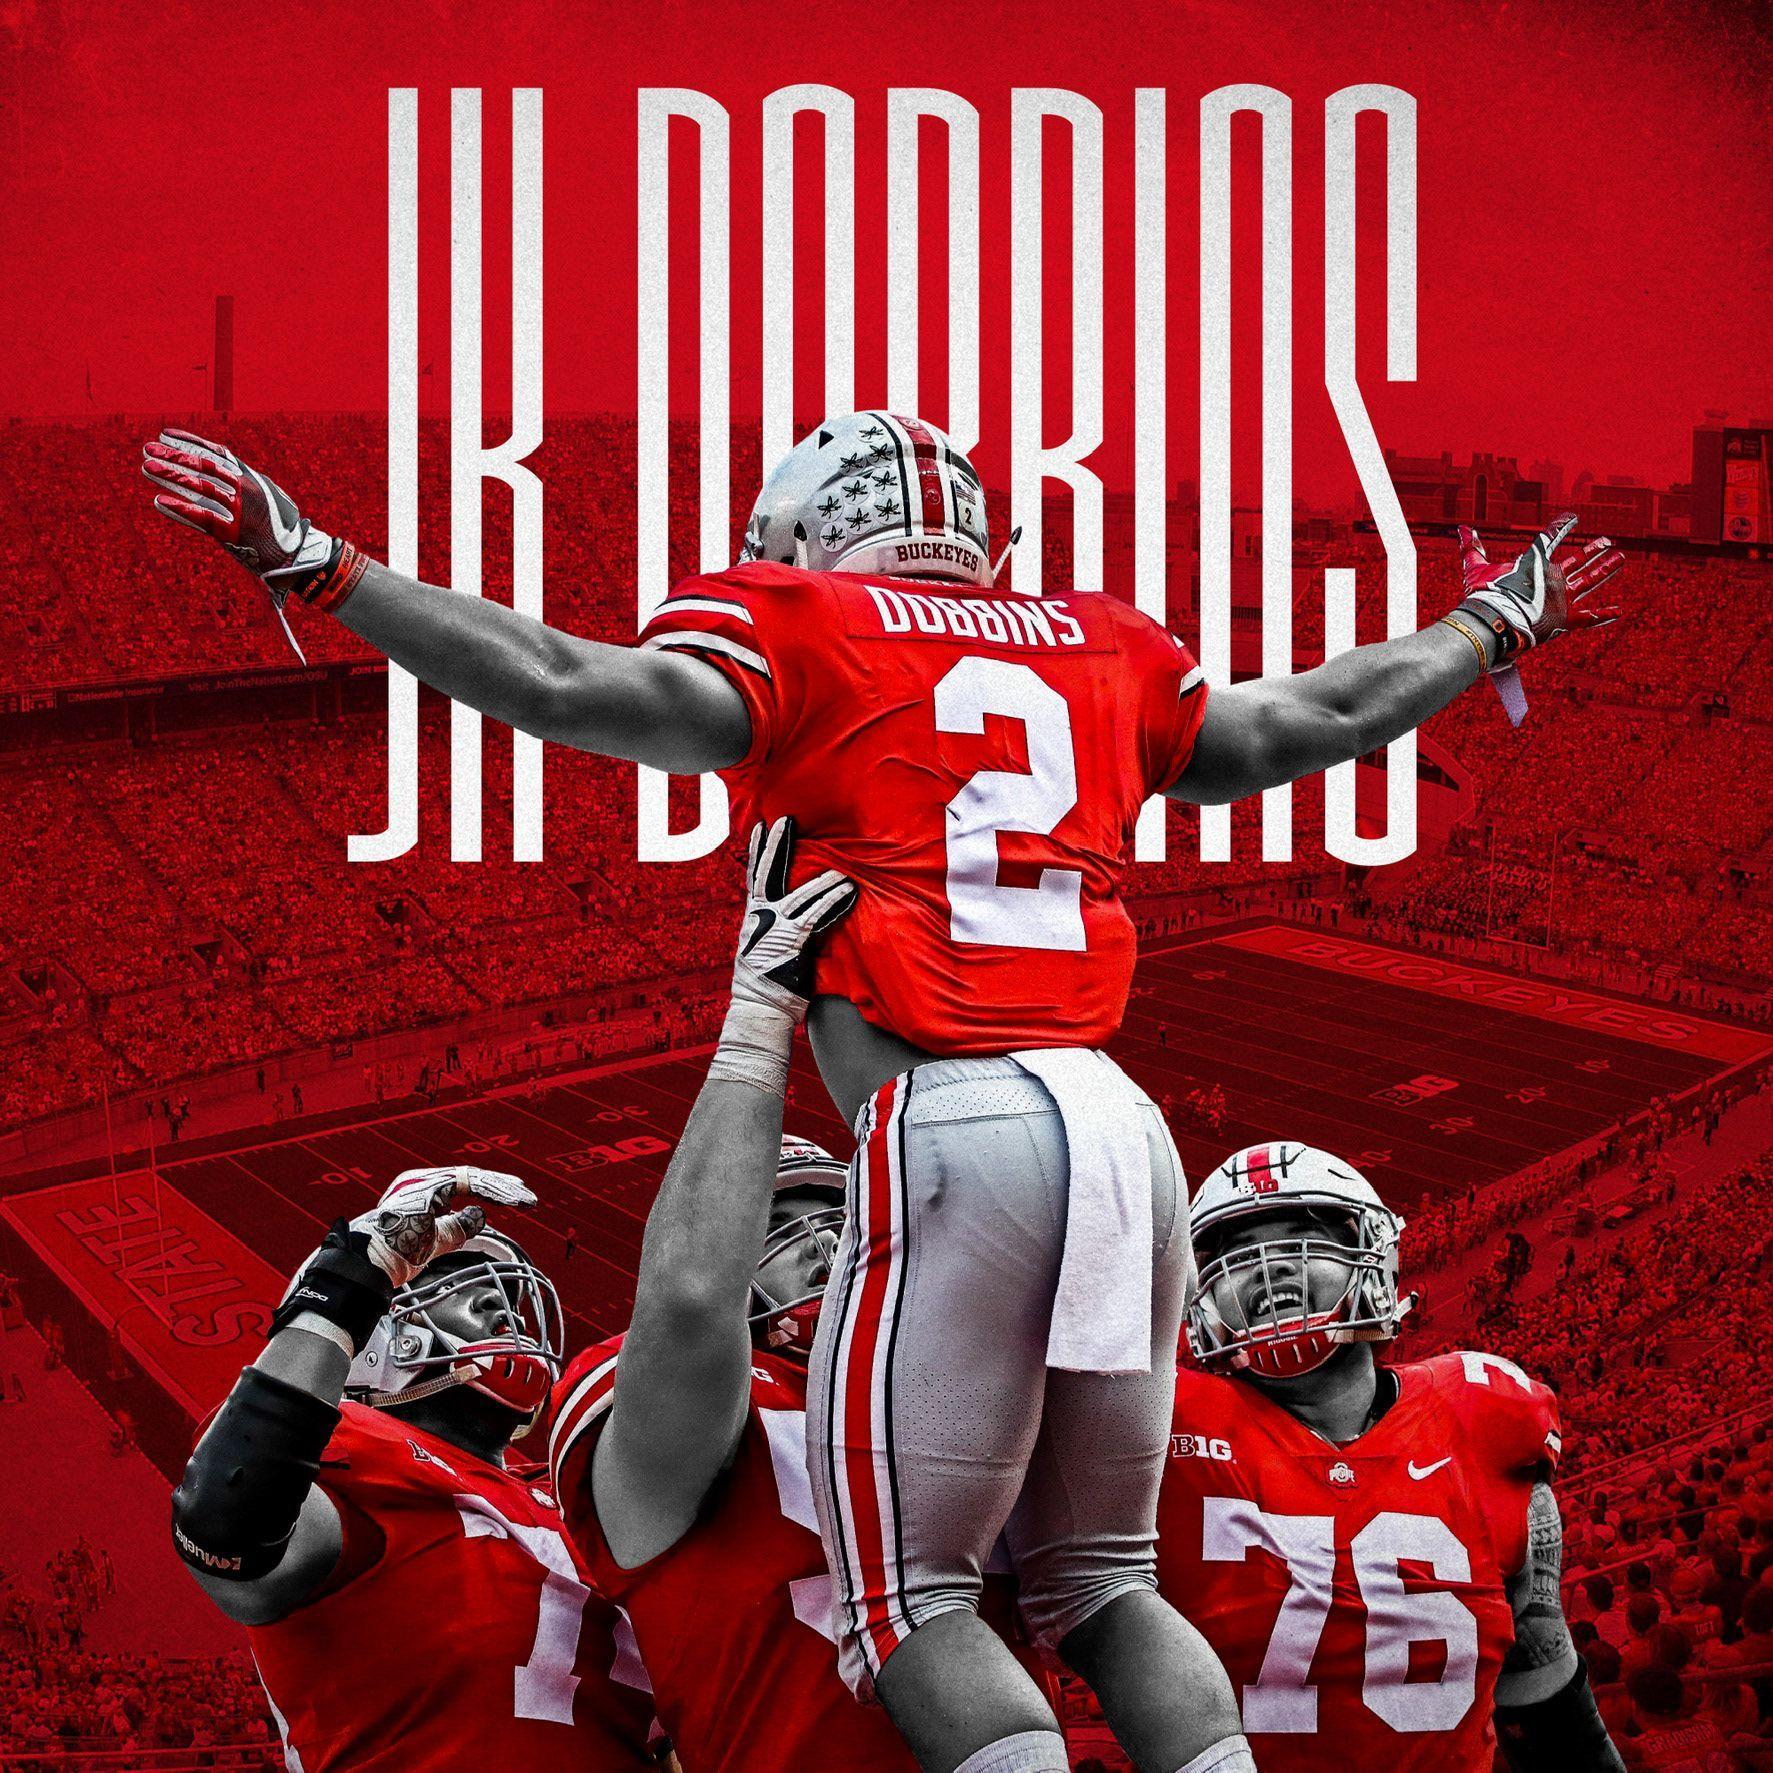 Daily Sports Designs 330 365 Jk Dobbins Ohiostatebuckeyes In 2020 Ohio State Buckeyes Football Ohio State Football Ohio State Football Players